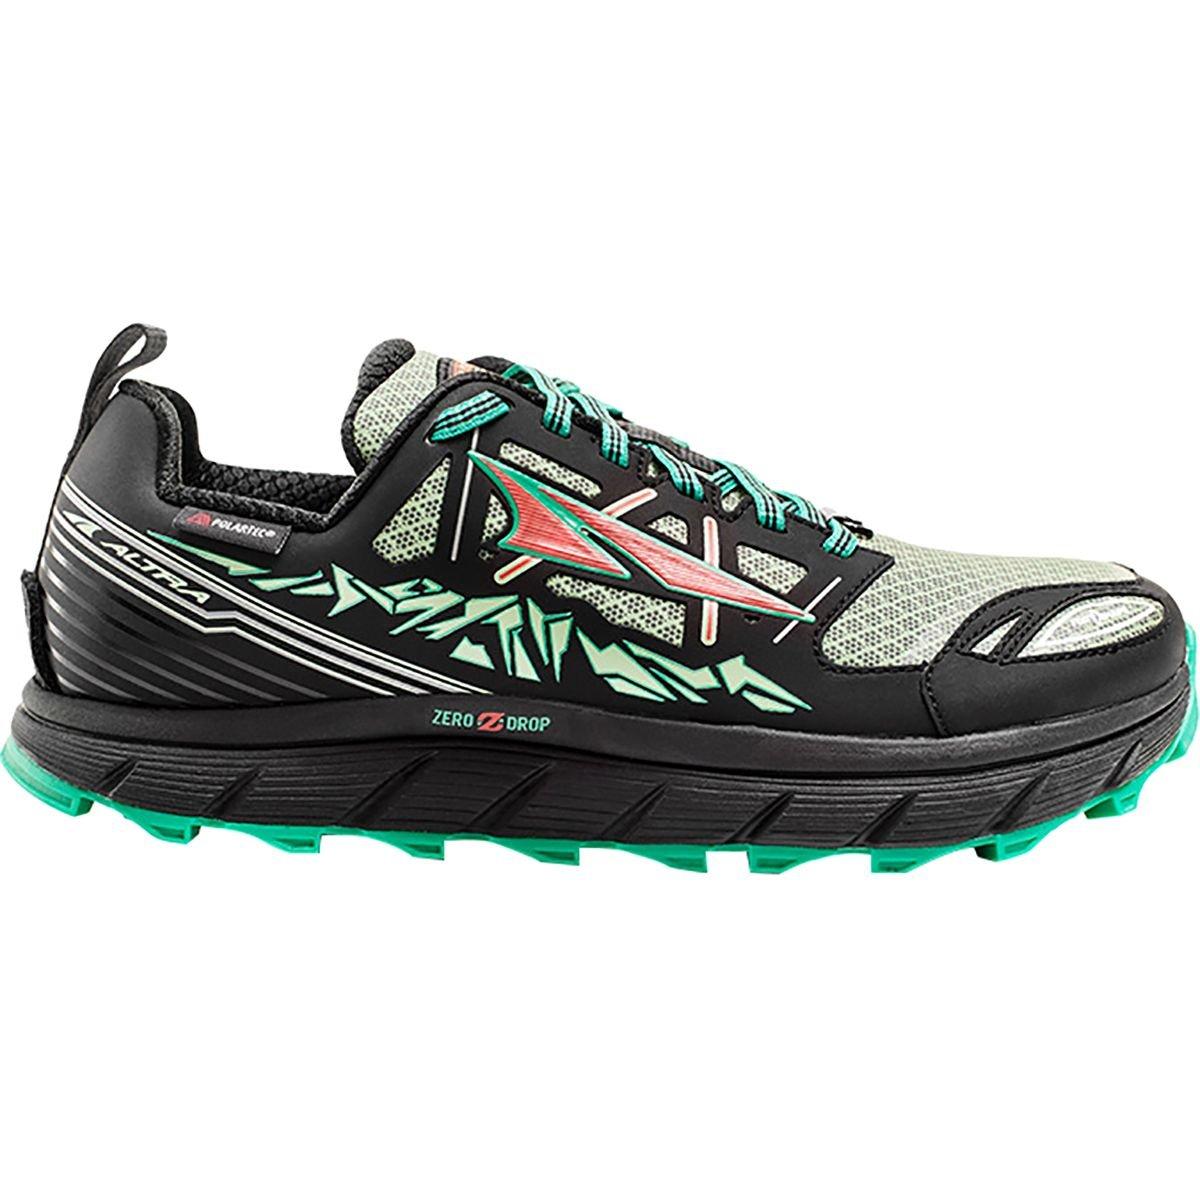 Altra Lone Peak 3.0 Low Neo Shoe - Women's B01B72EMHG 11 B(M) US|Black/Mint